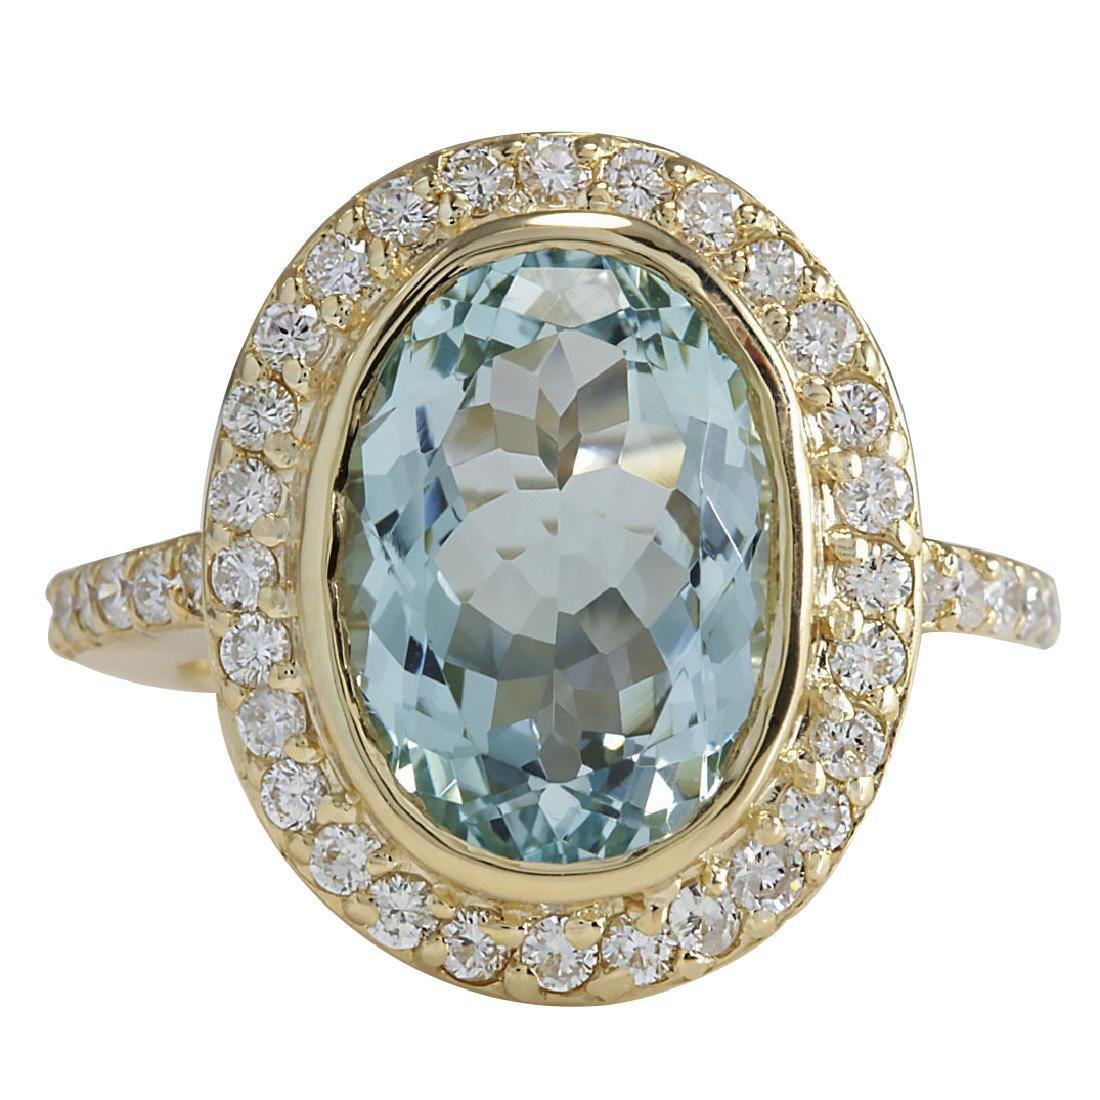 6.35CTW Natural Aquamarine And Diamond Ring In 18K